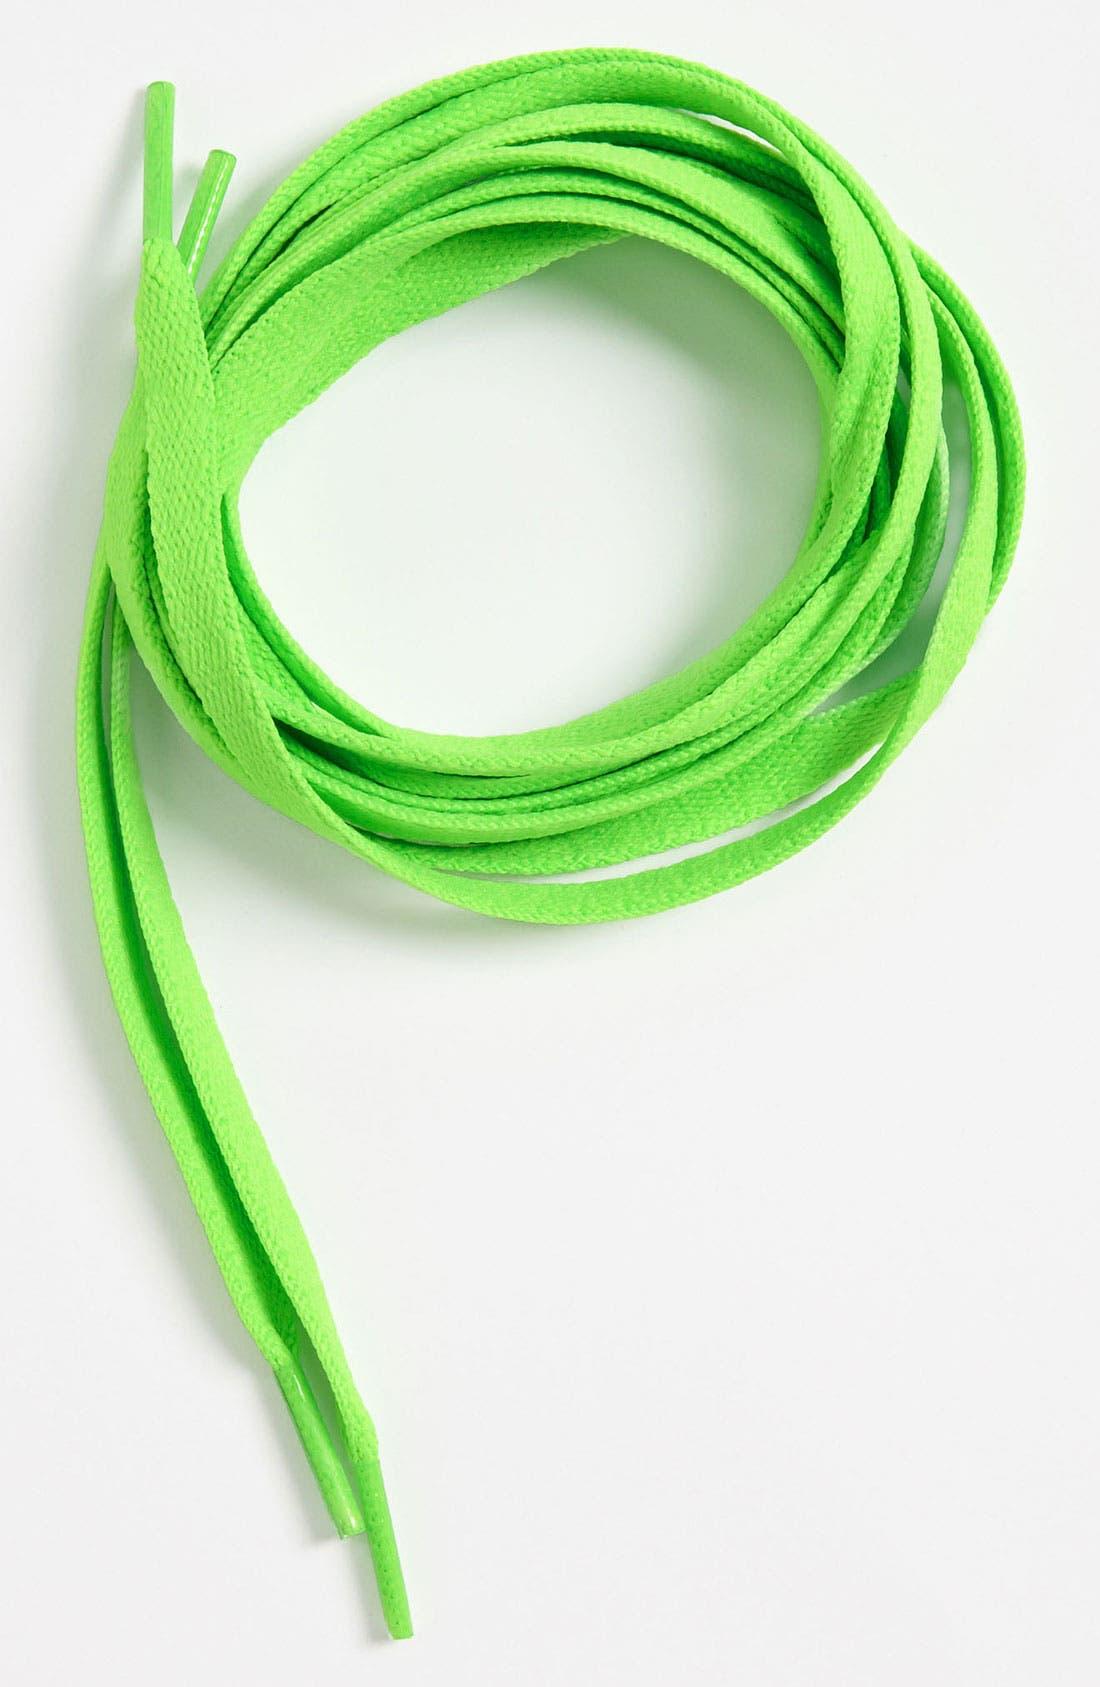 Main Image - Nordstrom Flat Shoelaces (Big Kid)